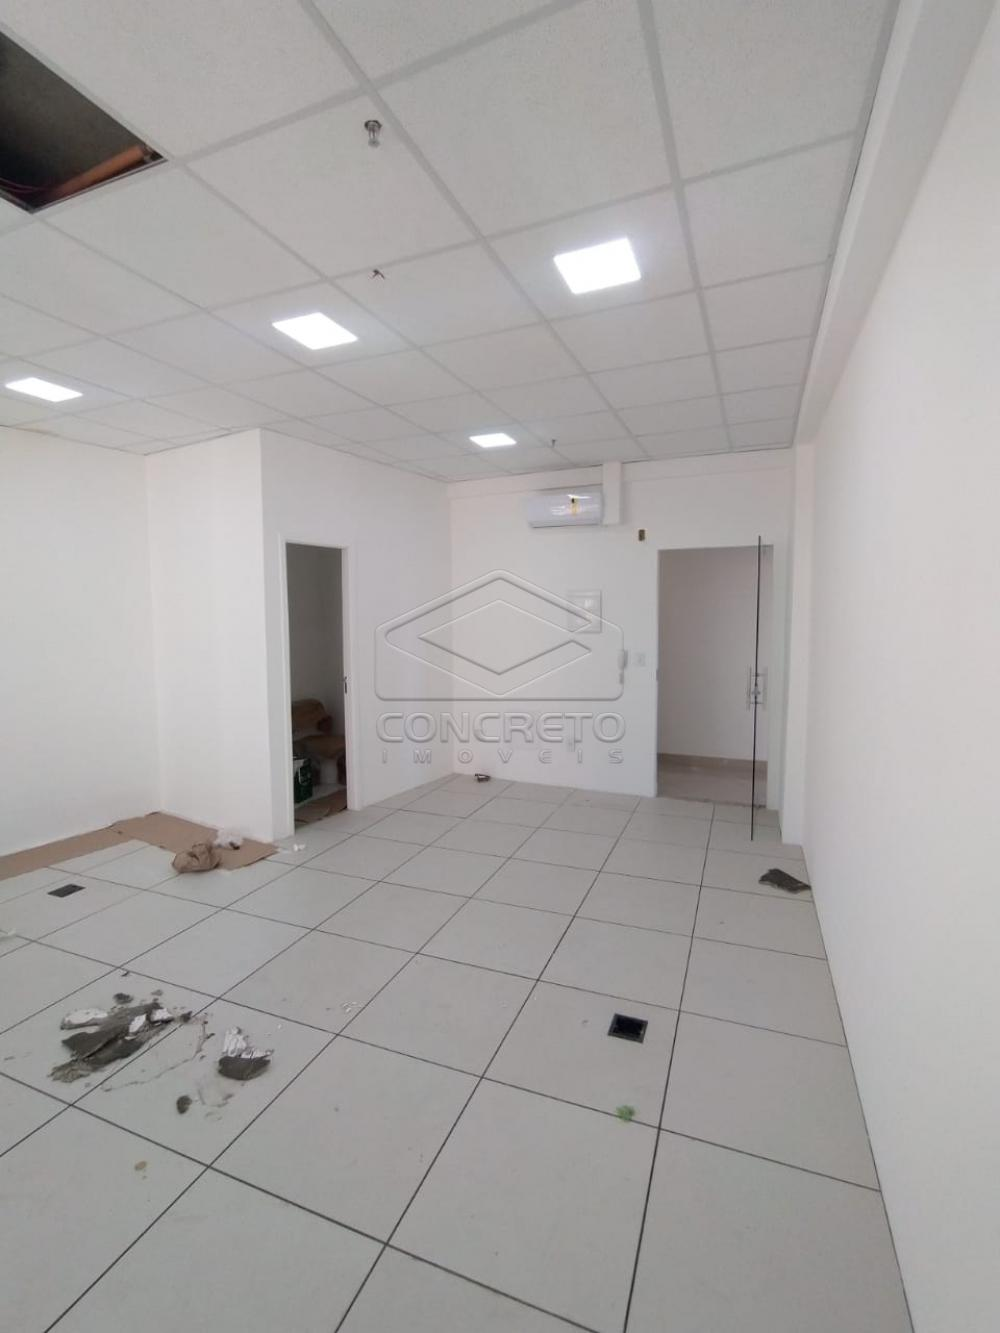 Alugar Comercial / Sala em Bauru apenas R$ 1.300,00 - Foto 2